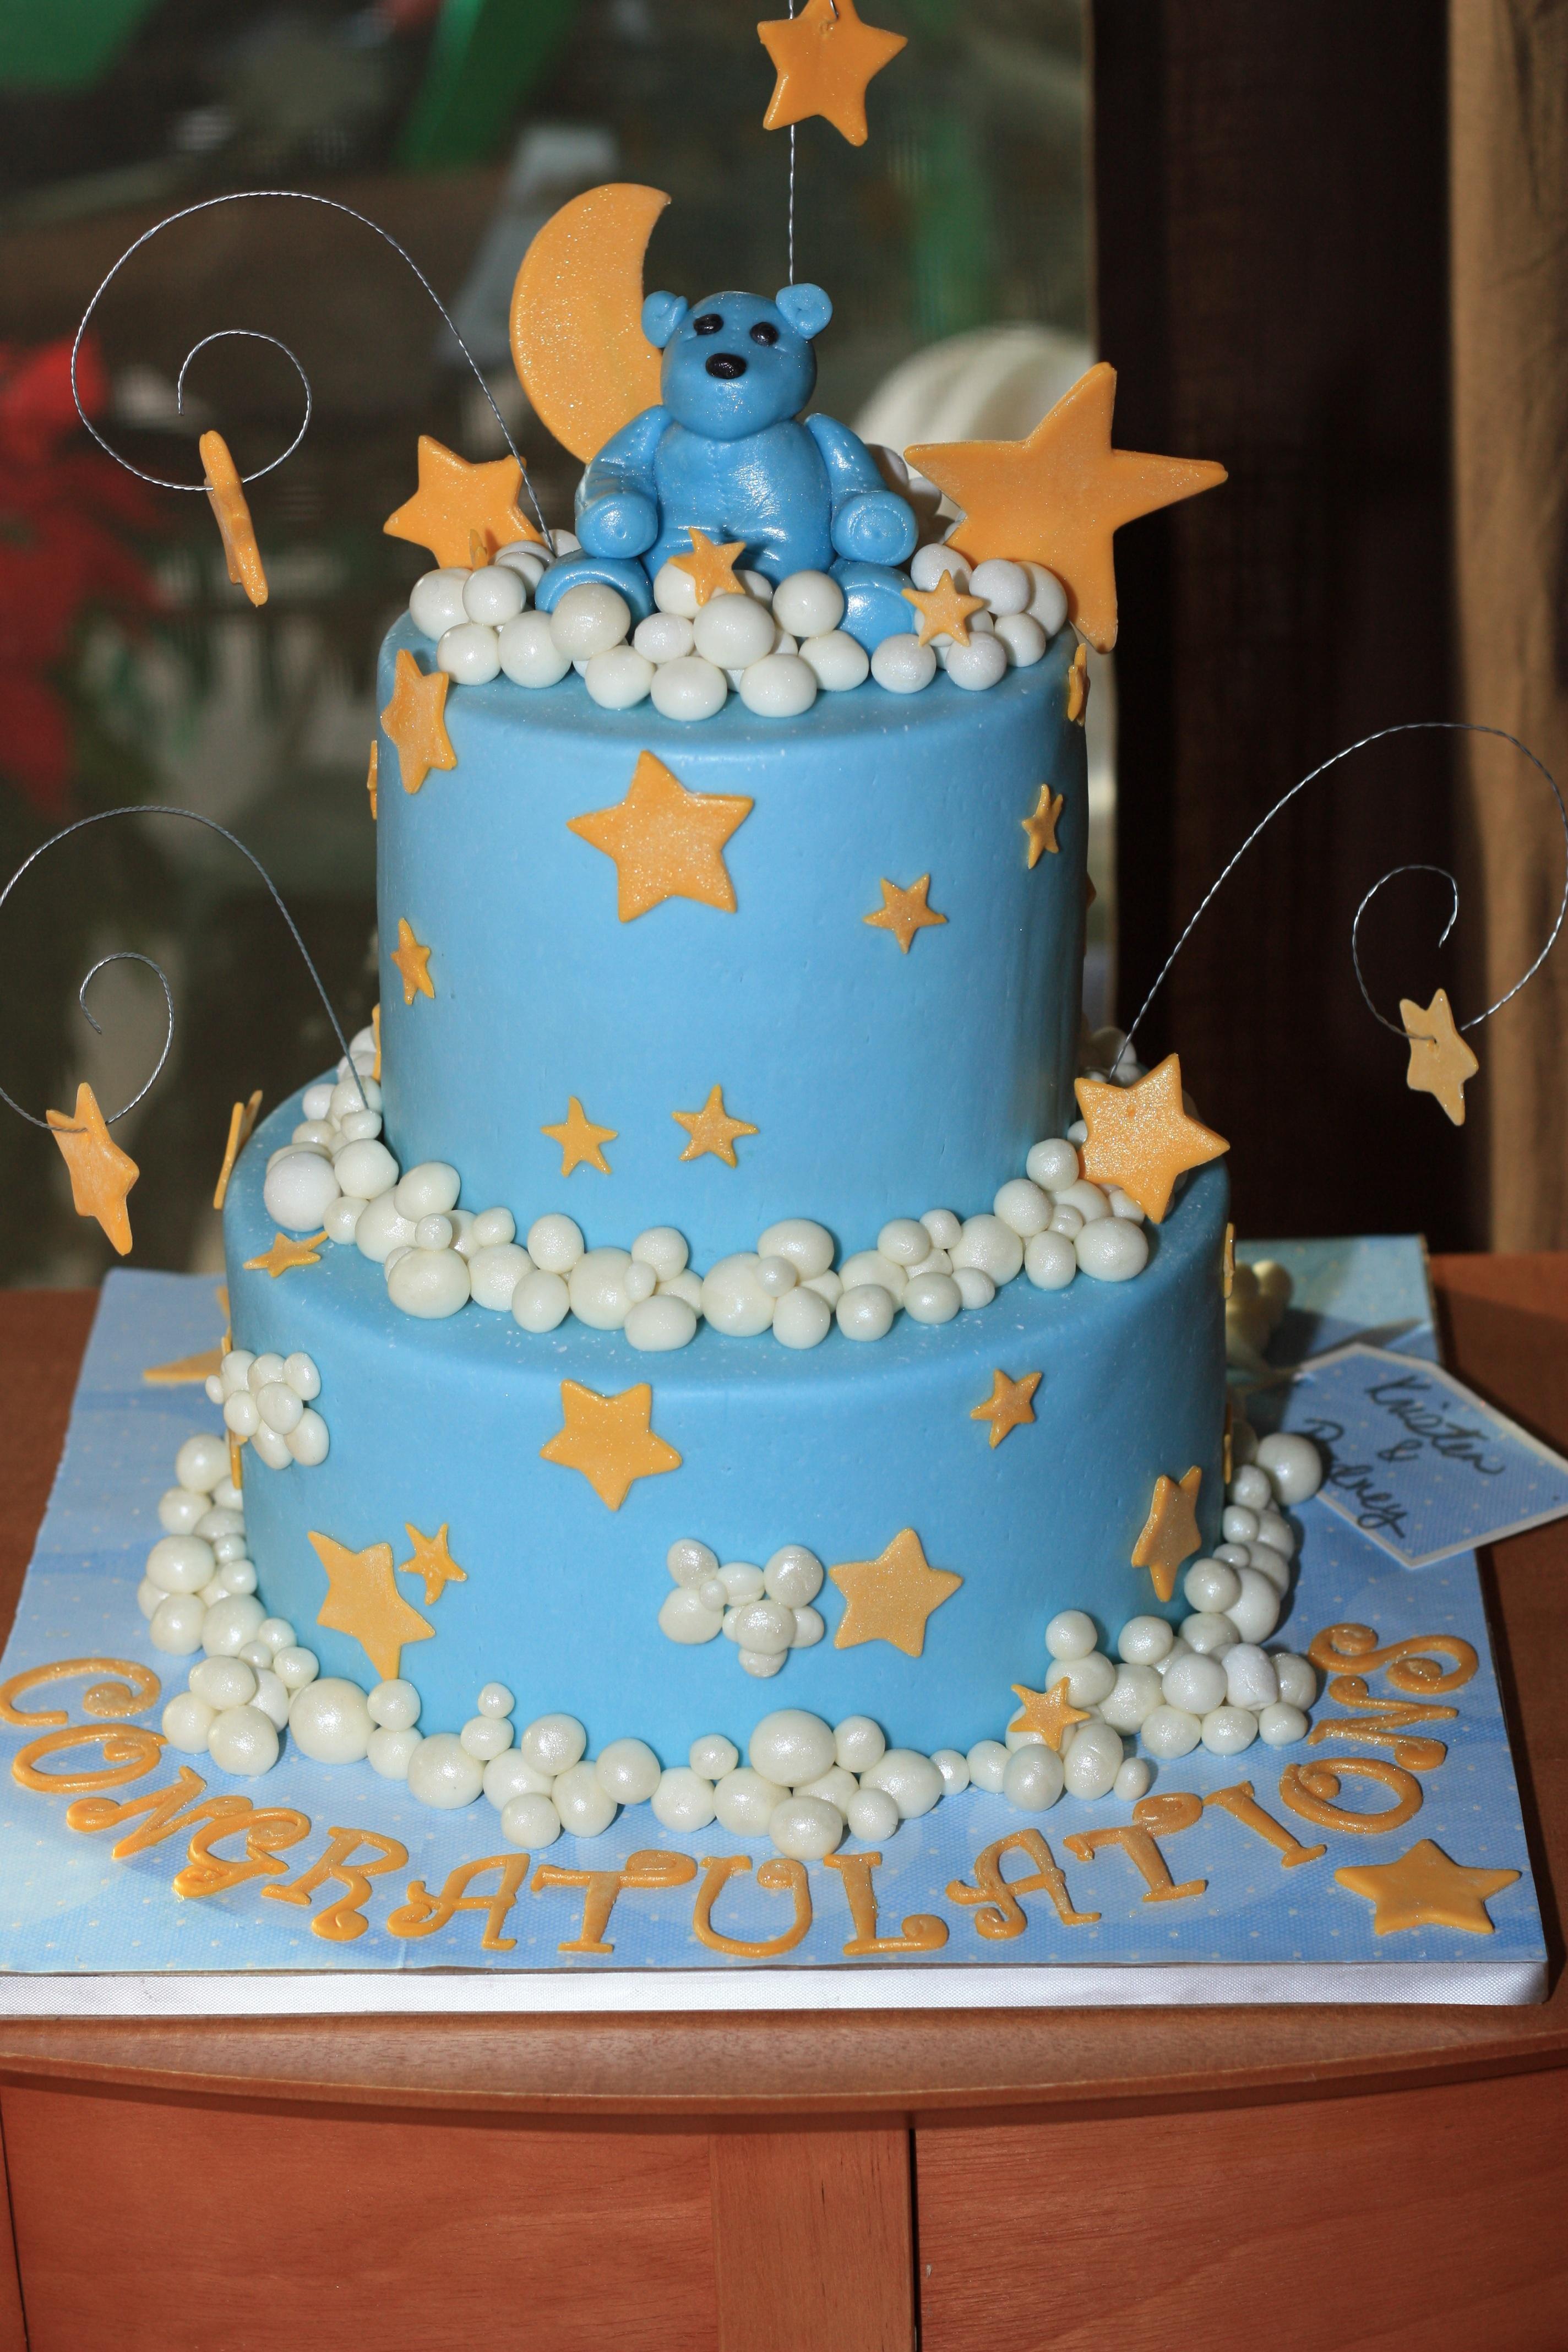 fotos gratis dulce comida azul postre pastel de cumpleaos formacin de hielo fiesta pastel de boda torta pasta de azcar crema de mantequilla